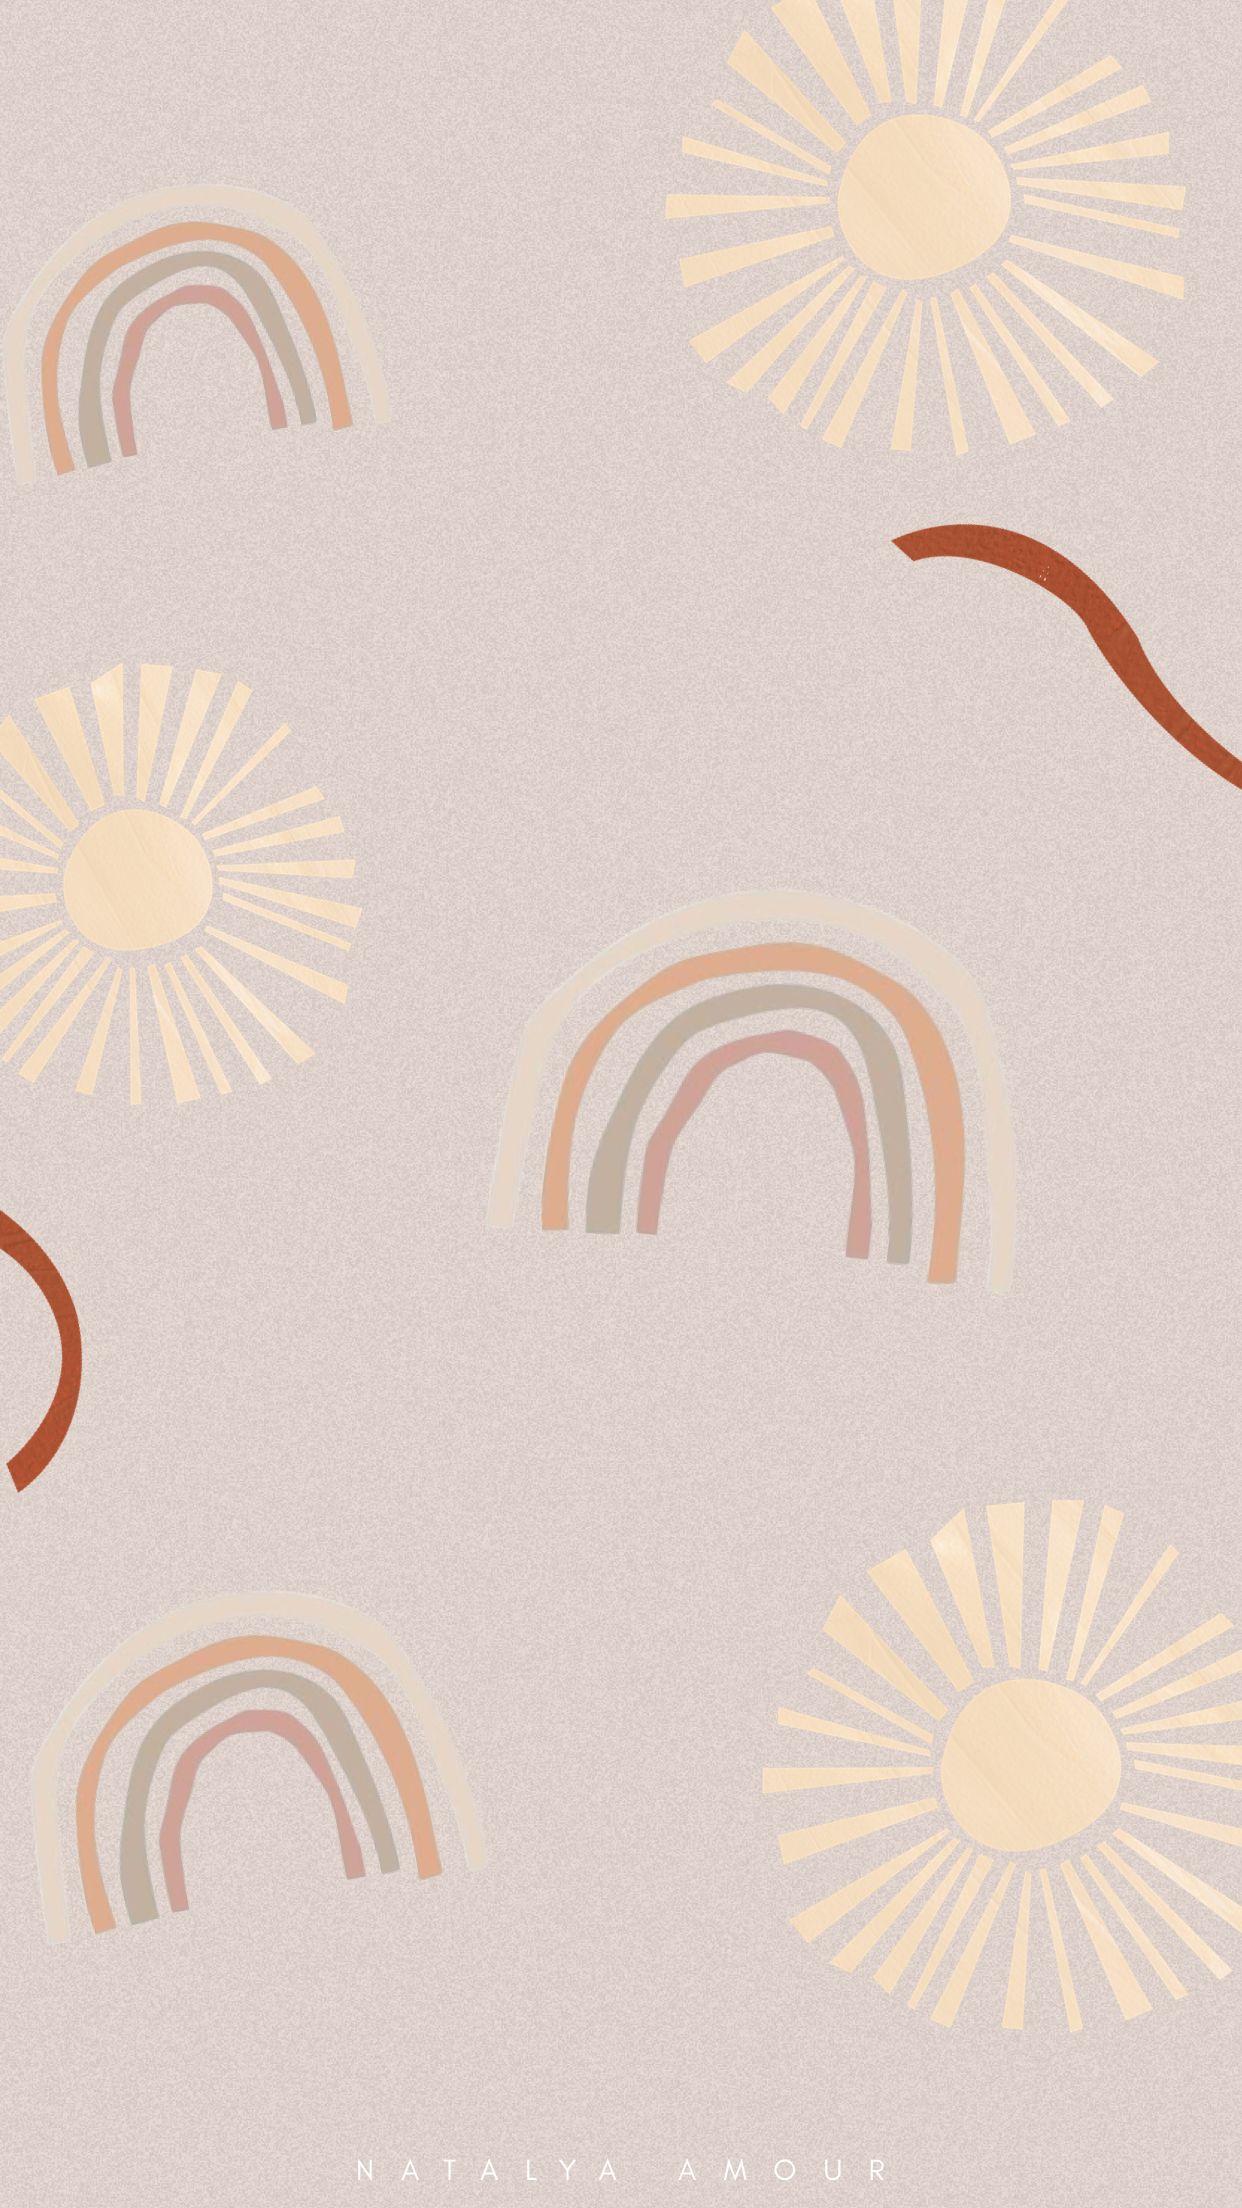 January Wallpaper Freebies Pastel Iphone Wallpaper Boho Wallpaper Aesthetic Iphone Wallpaper